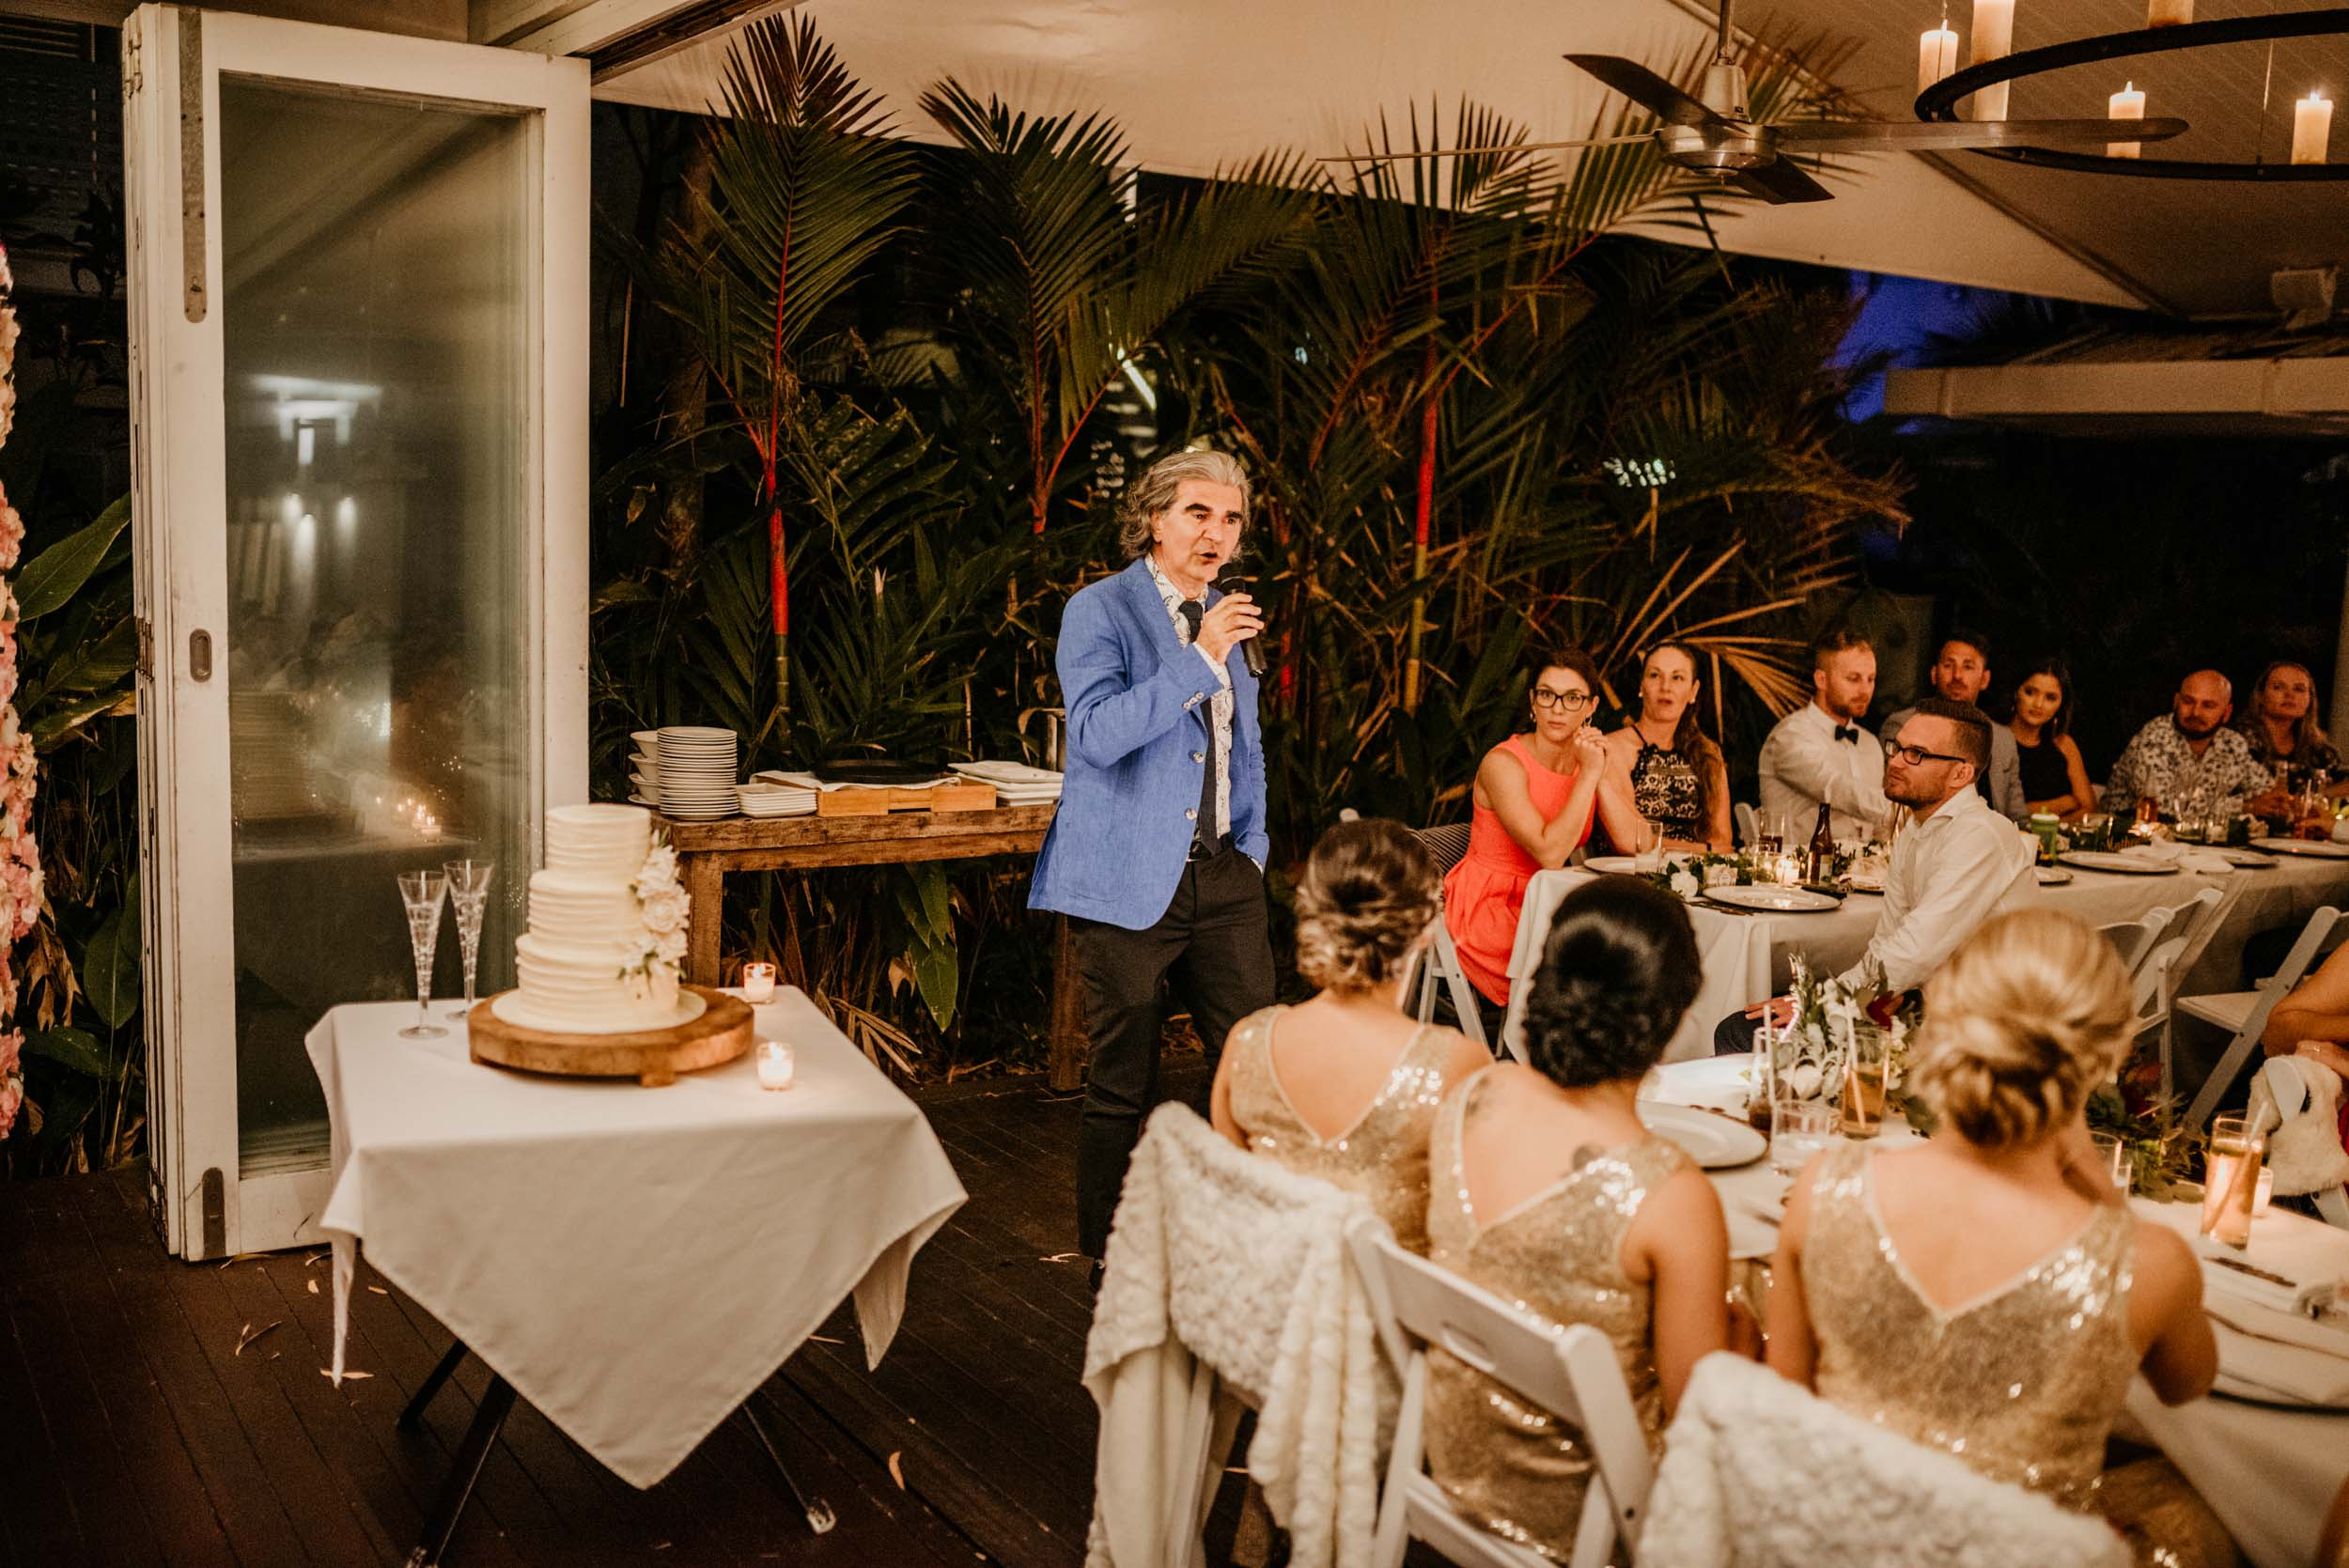 The Raw Photographer - Cairns Wedding Photographer - Beach Palm Cove Ceremony - Dress Irene Costa's Devine Bridal - Queensland-72.jpg